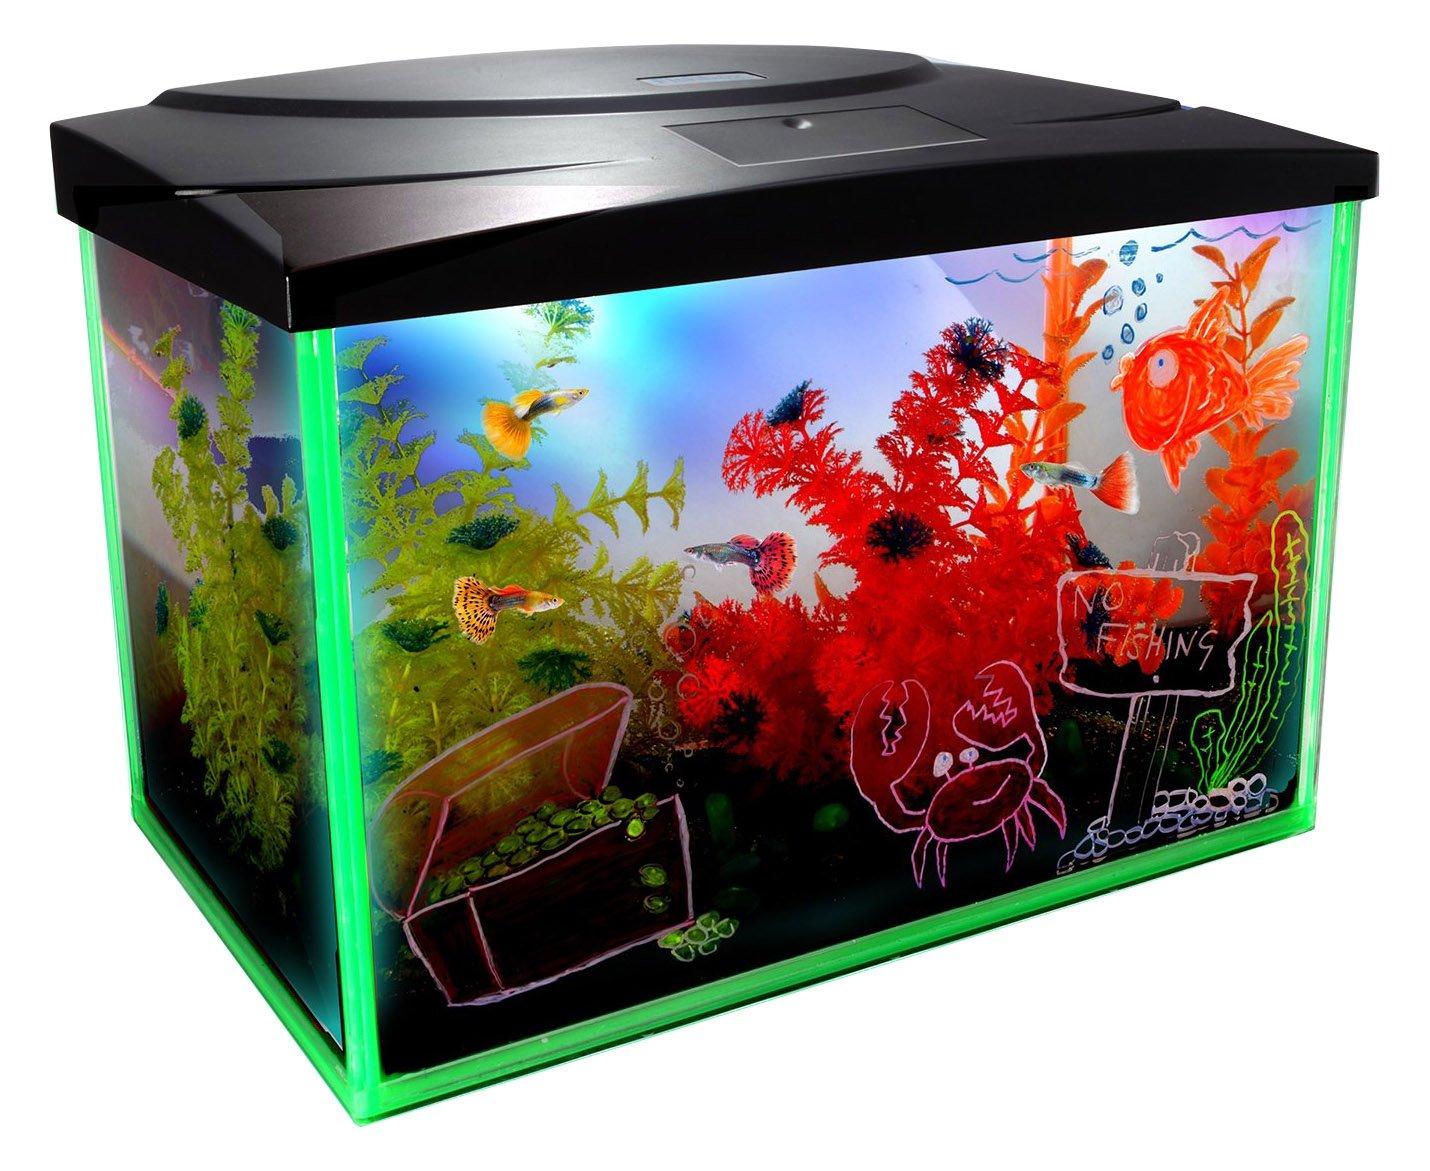 Interpet Kids Glow Interactive Aquarium, 30 Litre